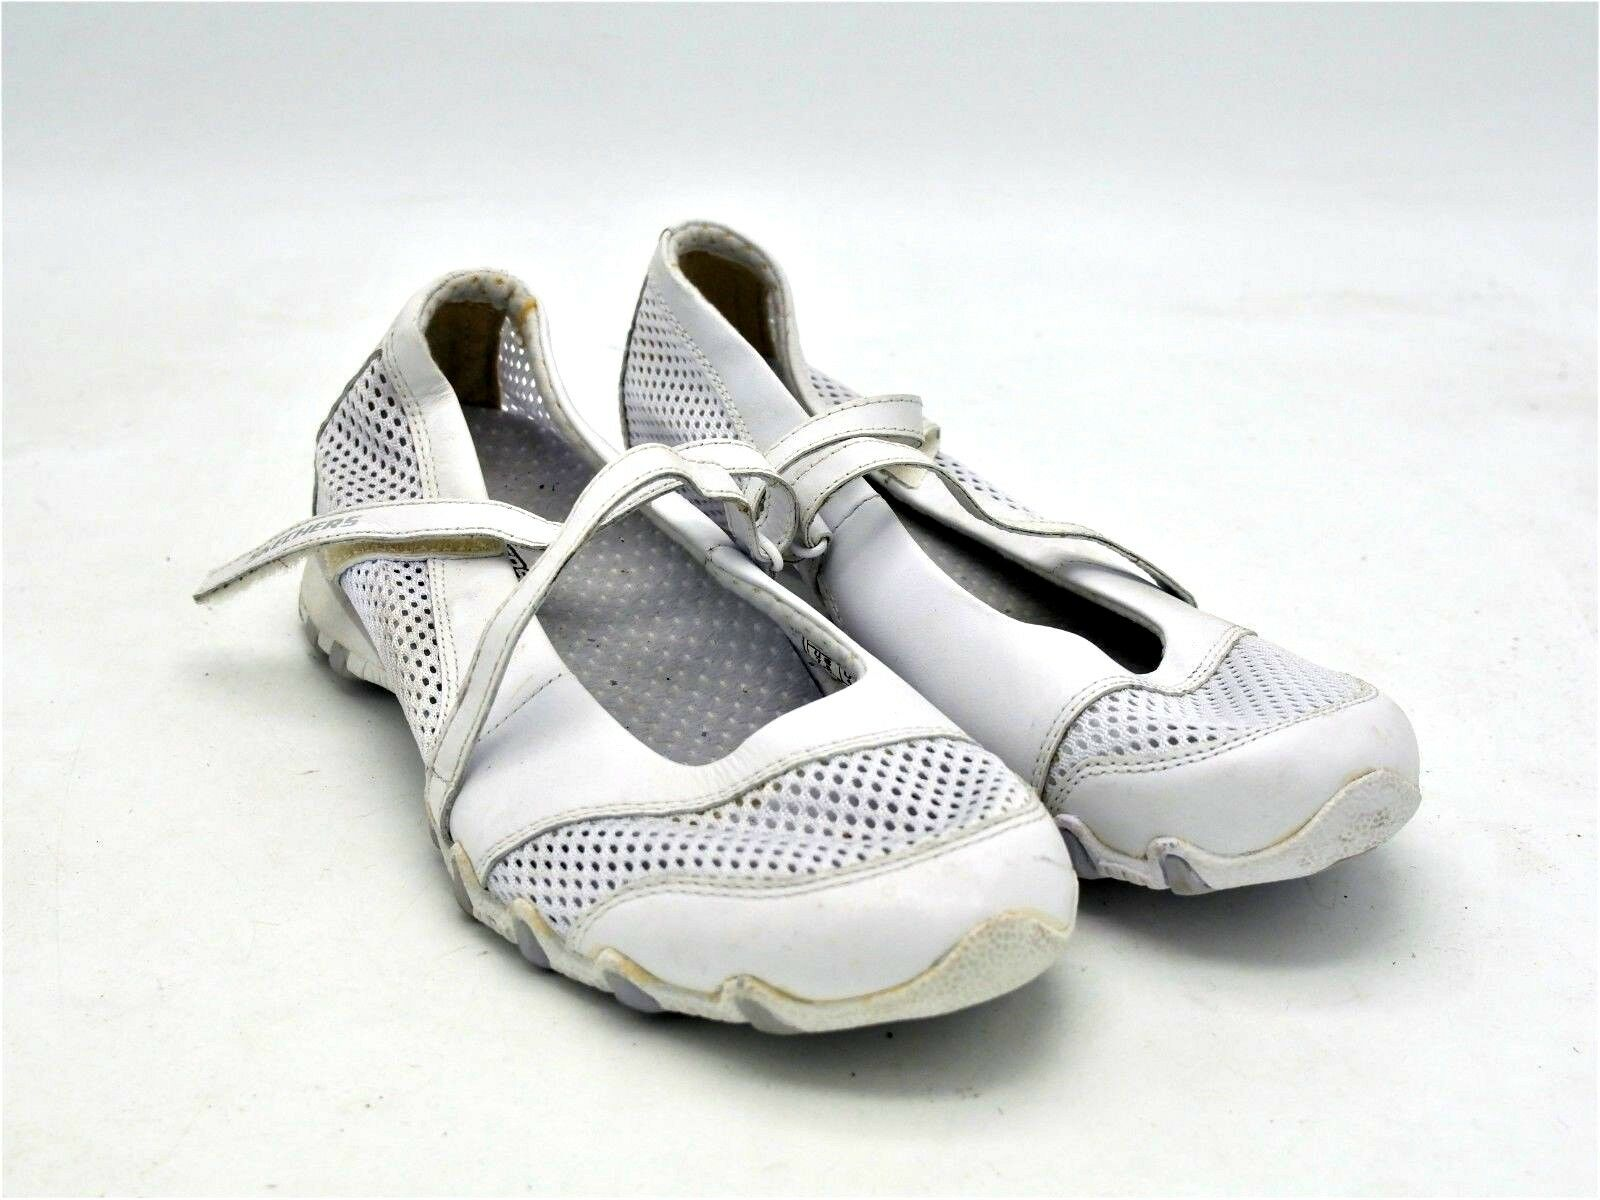 D1905 New Women's Skechers 21548 White Leather Fabric Flat 7.5 M